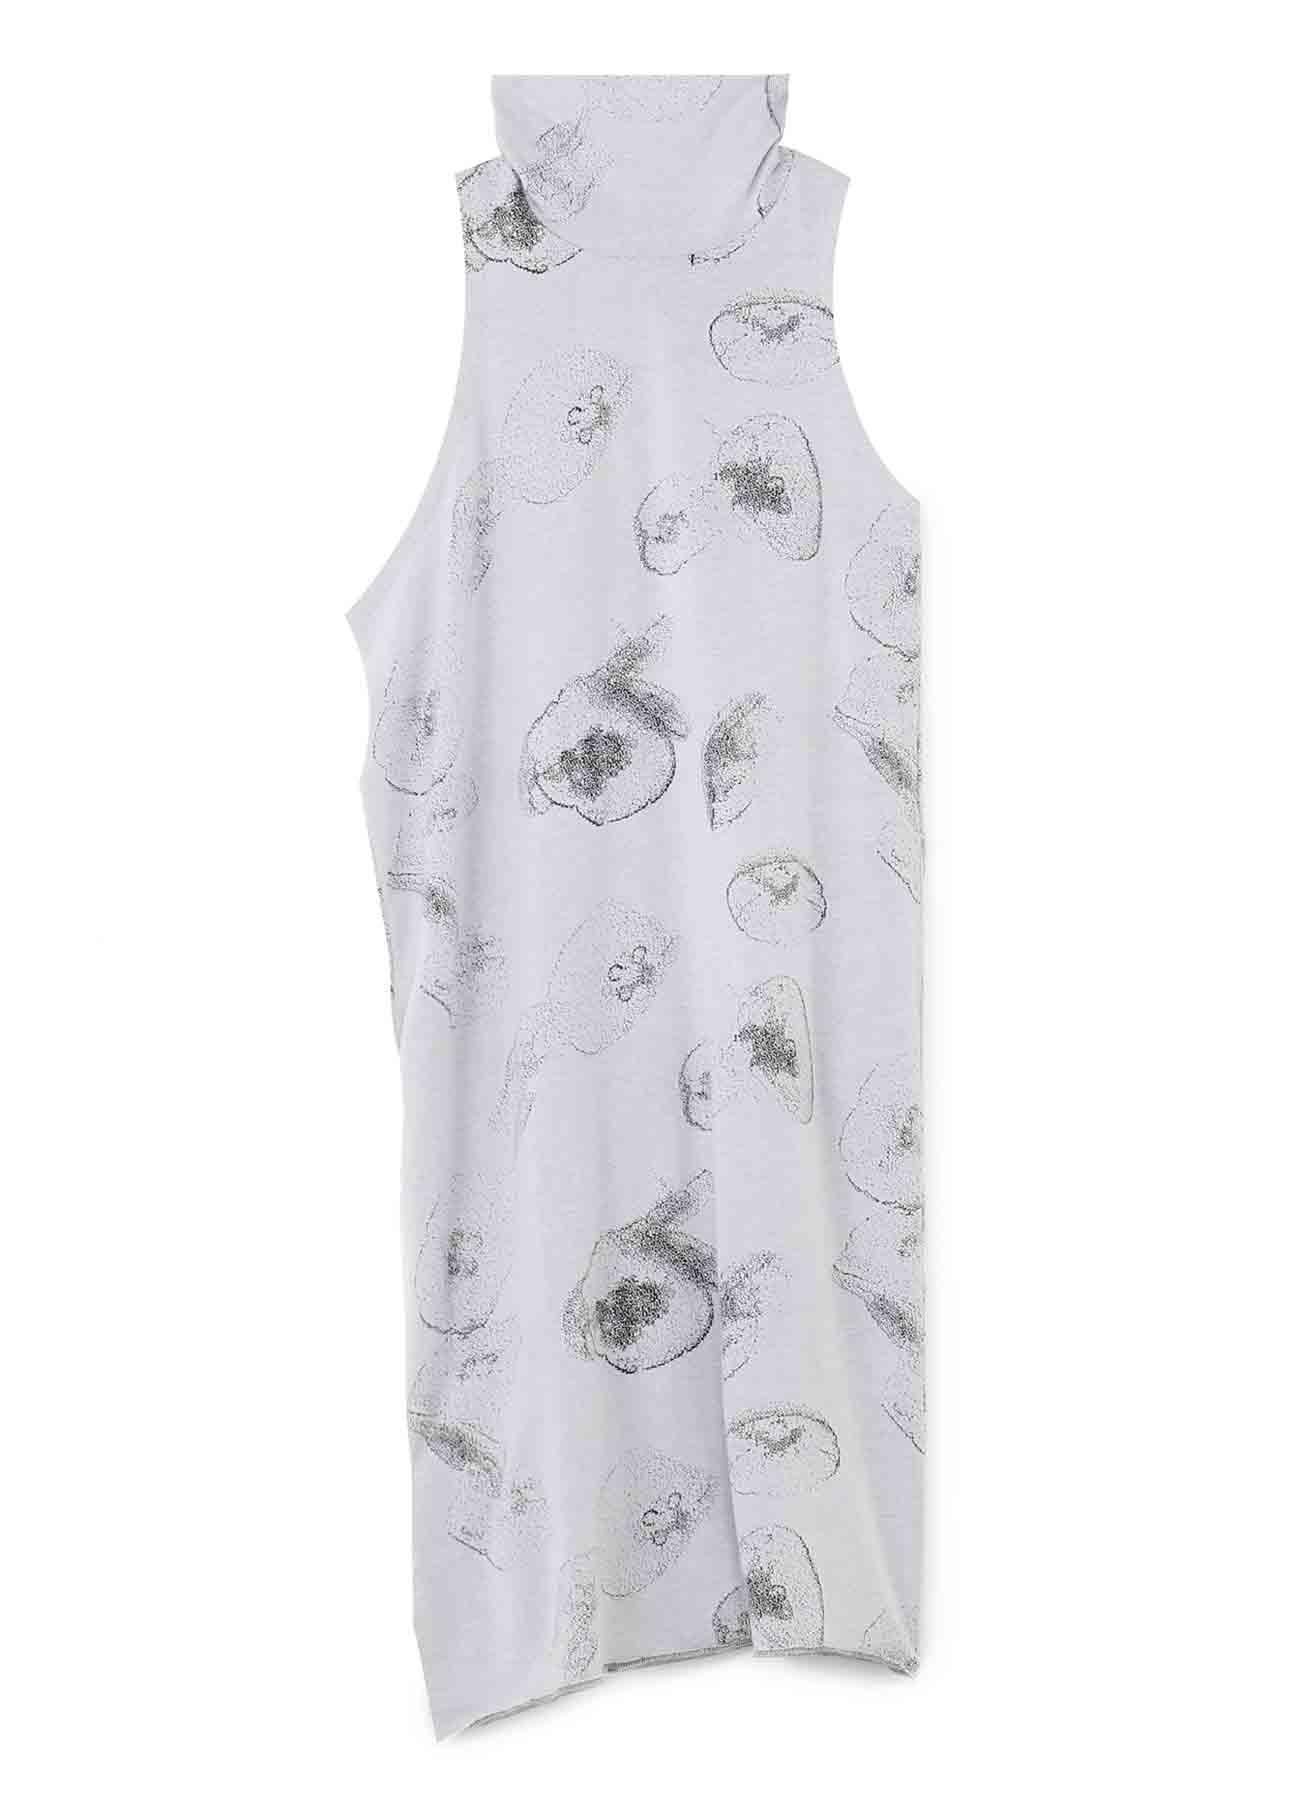 JELLYFISH JQ HIGH NECK SLEEVELESS DRESS